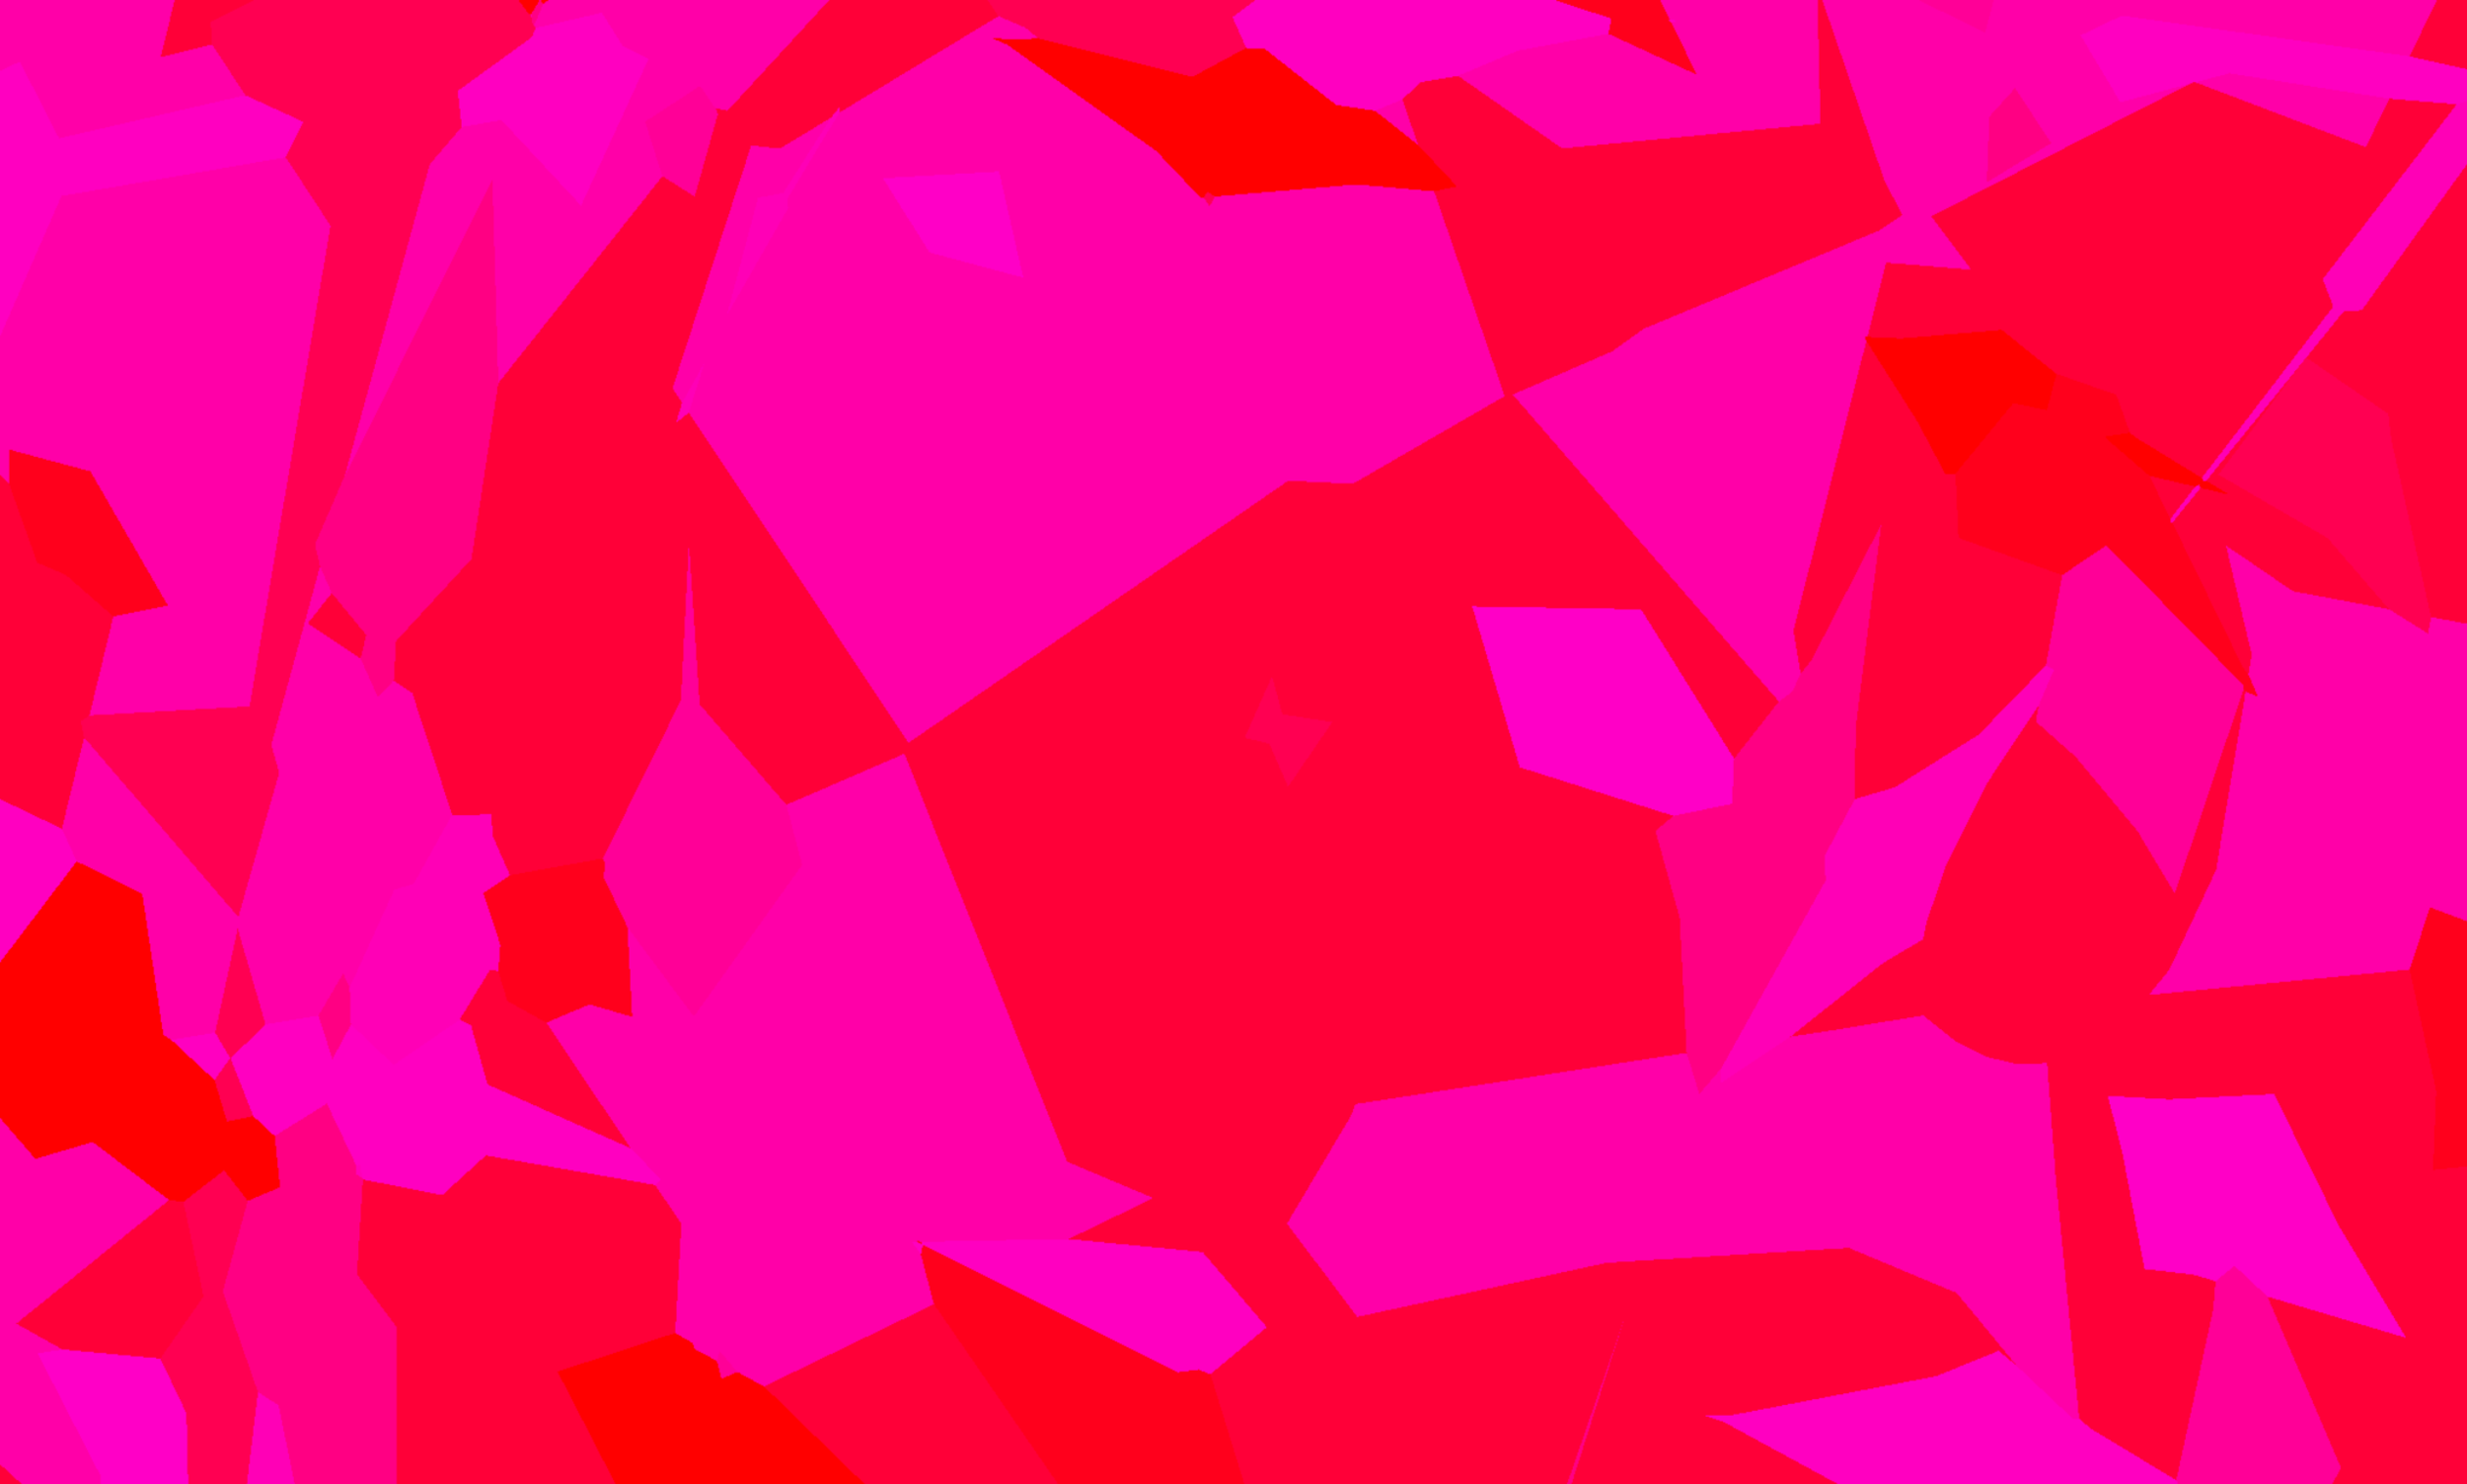 screenshot-0046.png